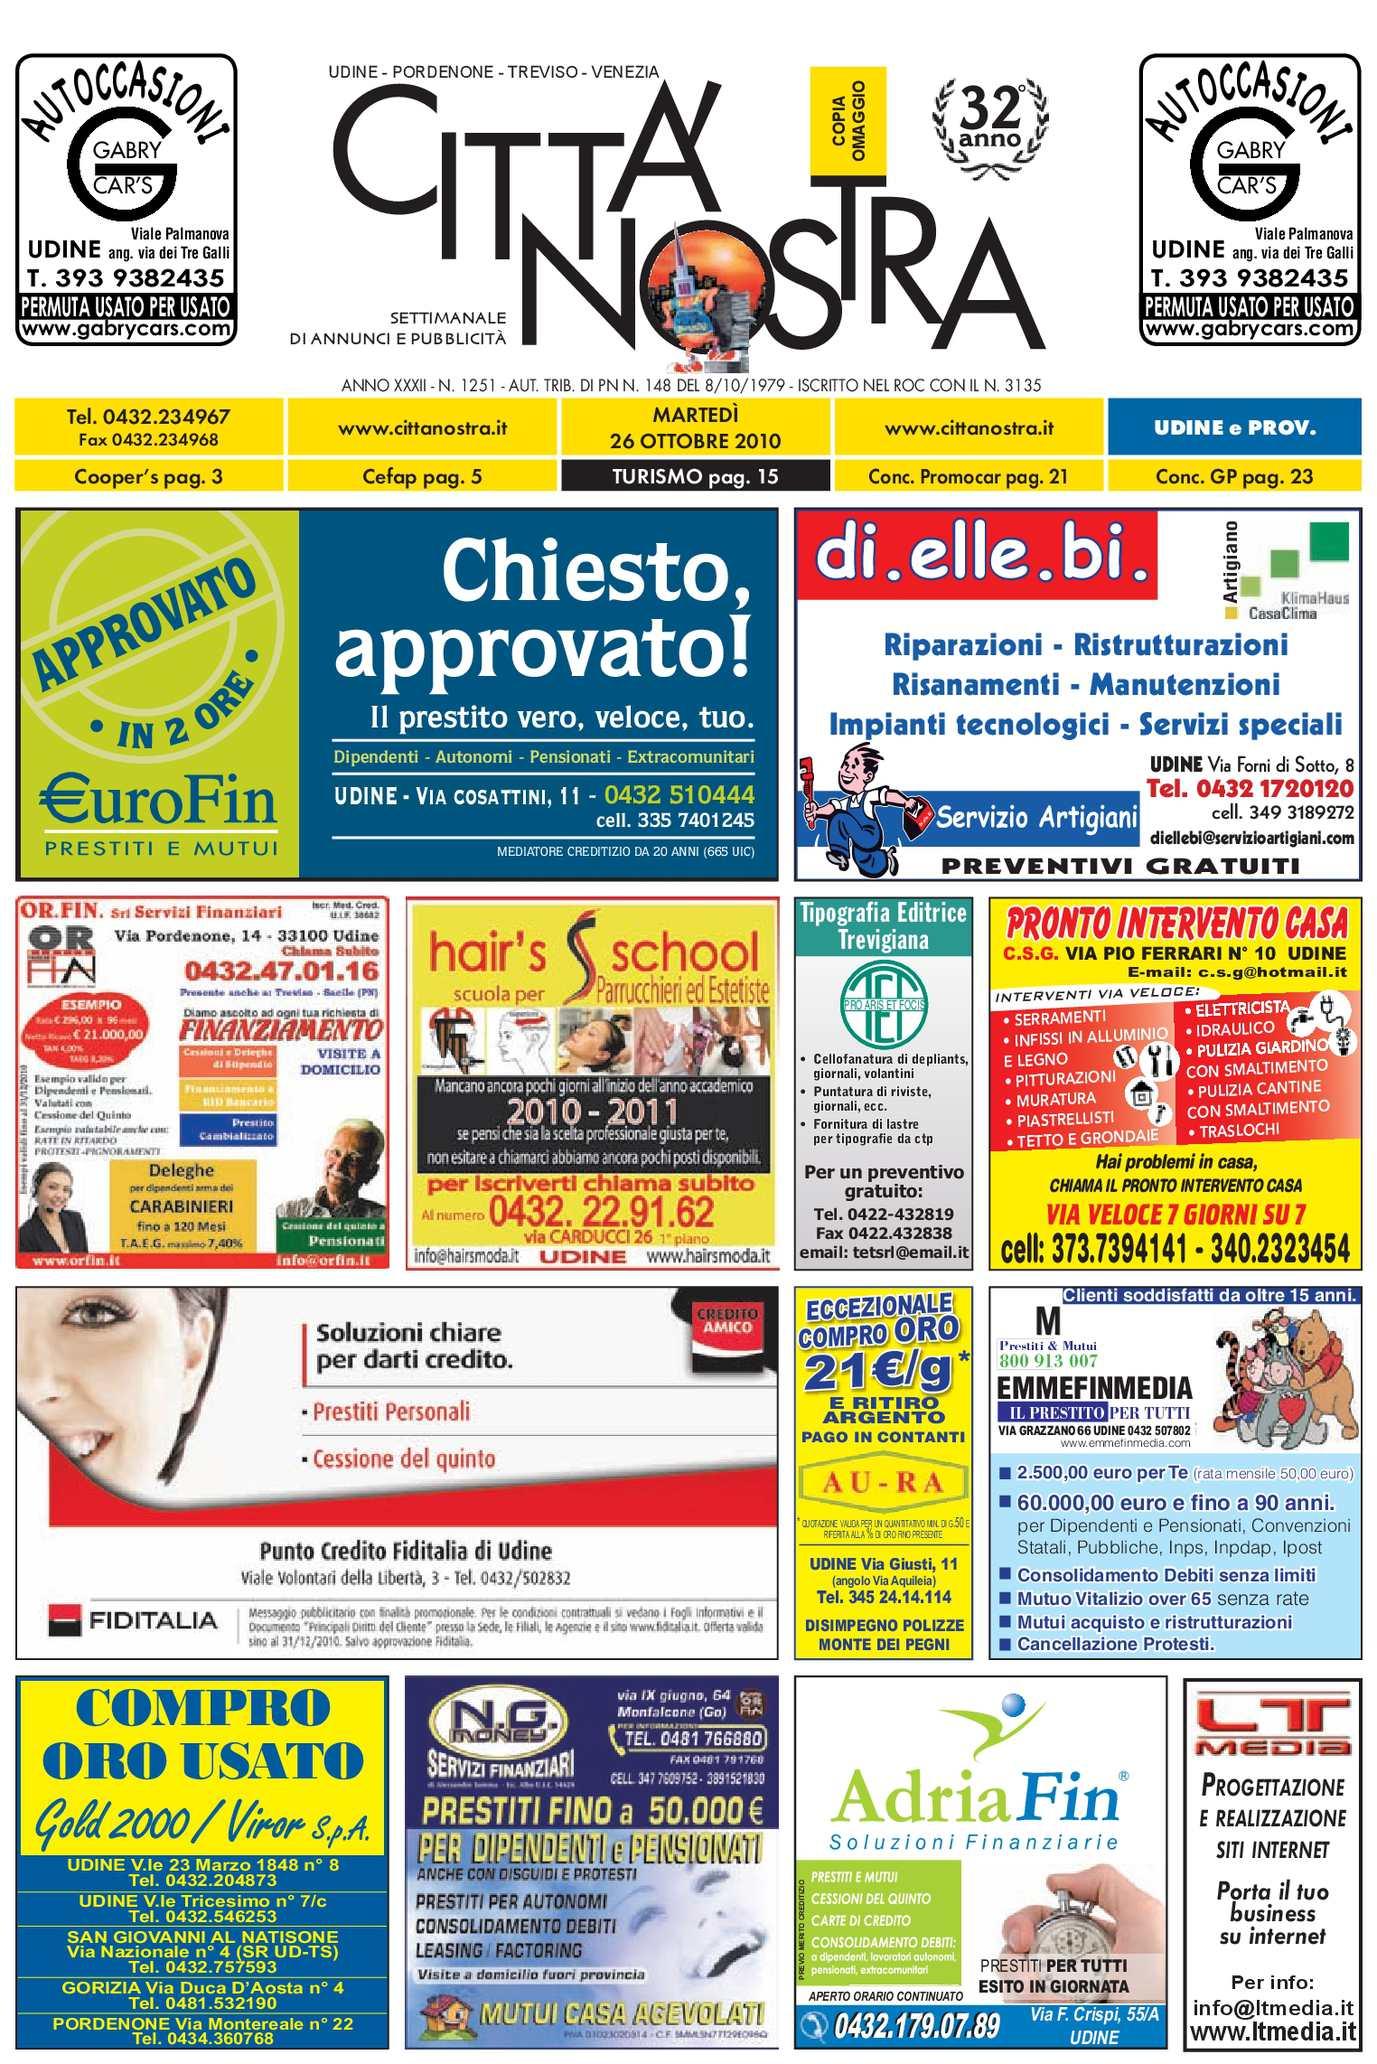 Calaméo Citt Nostra Udine Del 26 10 2010 N 1251